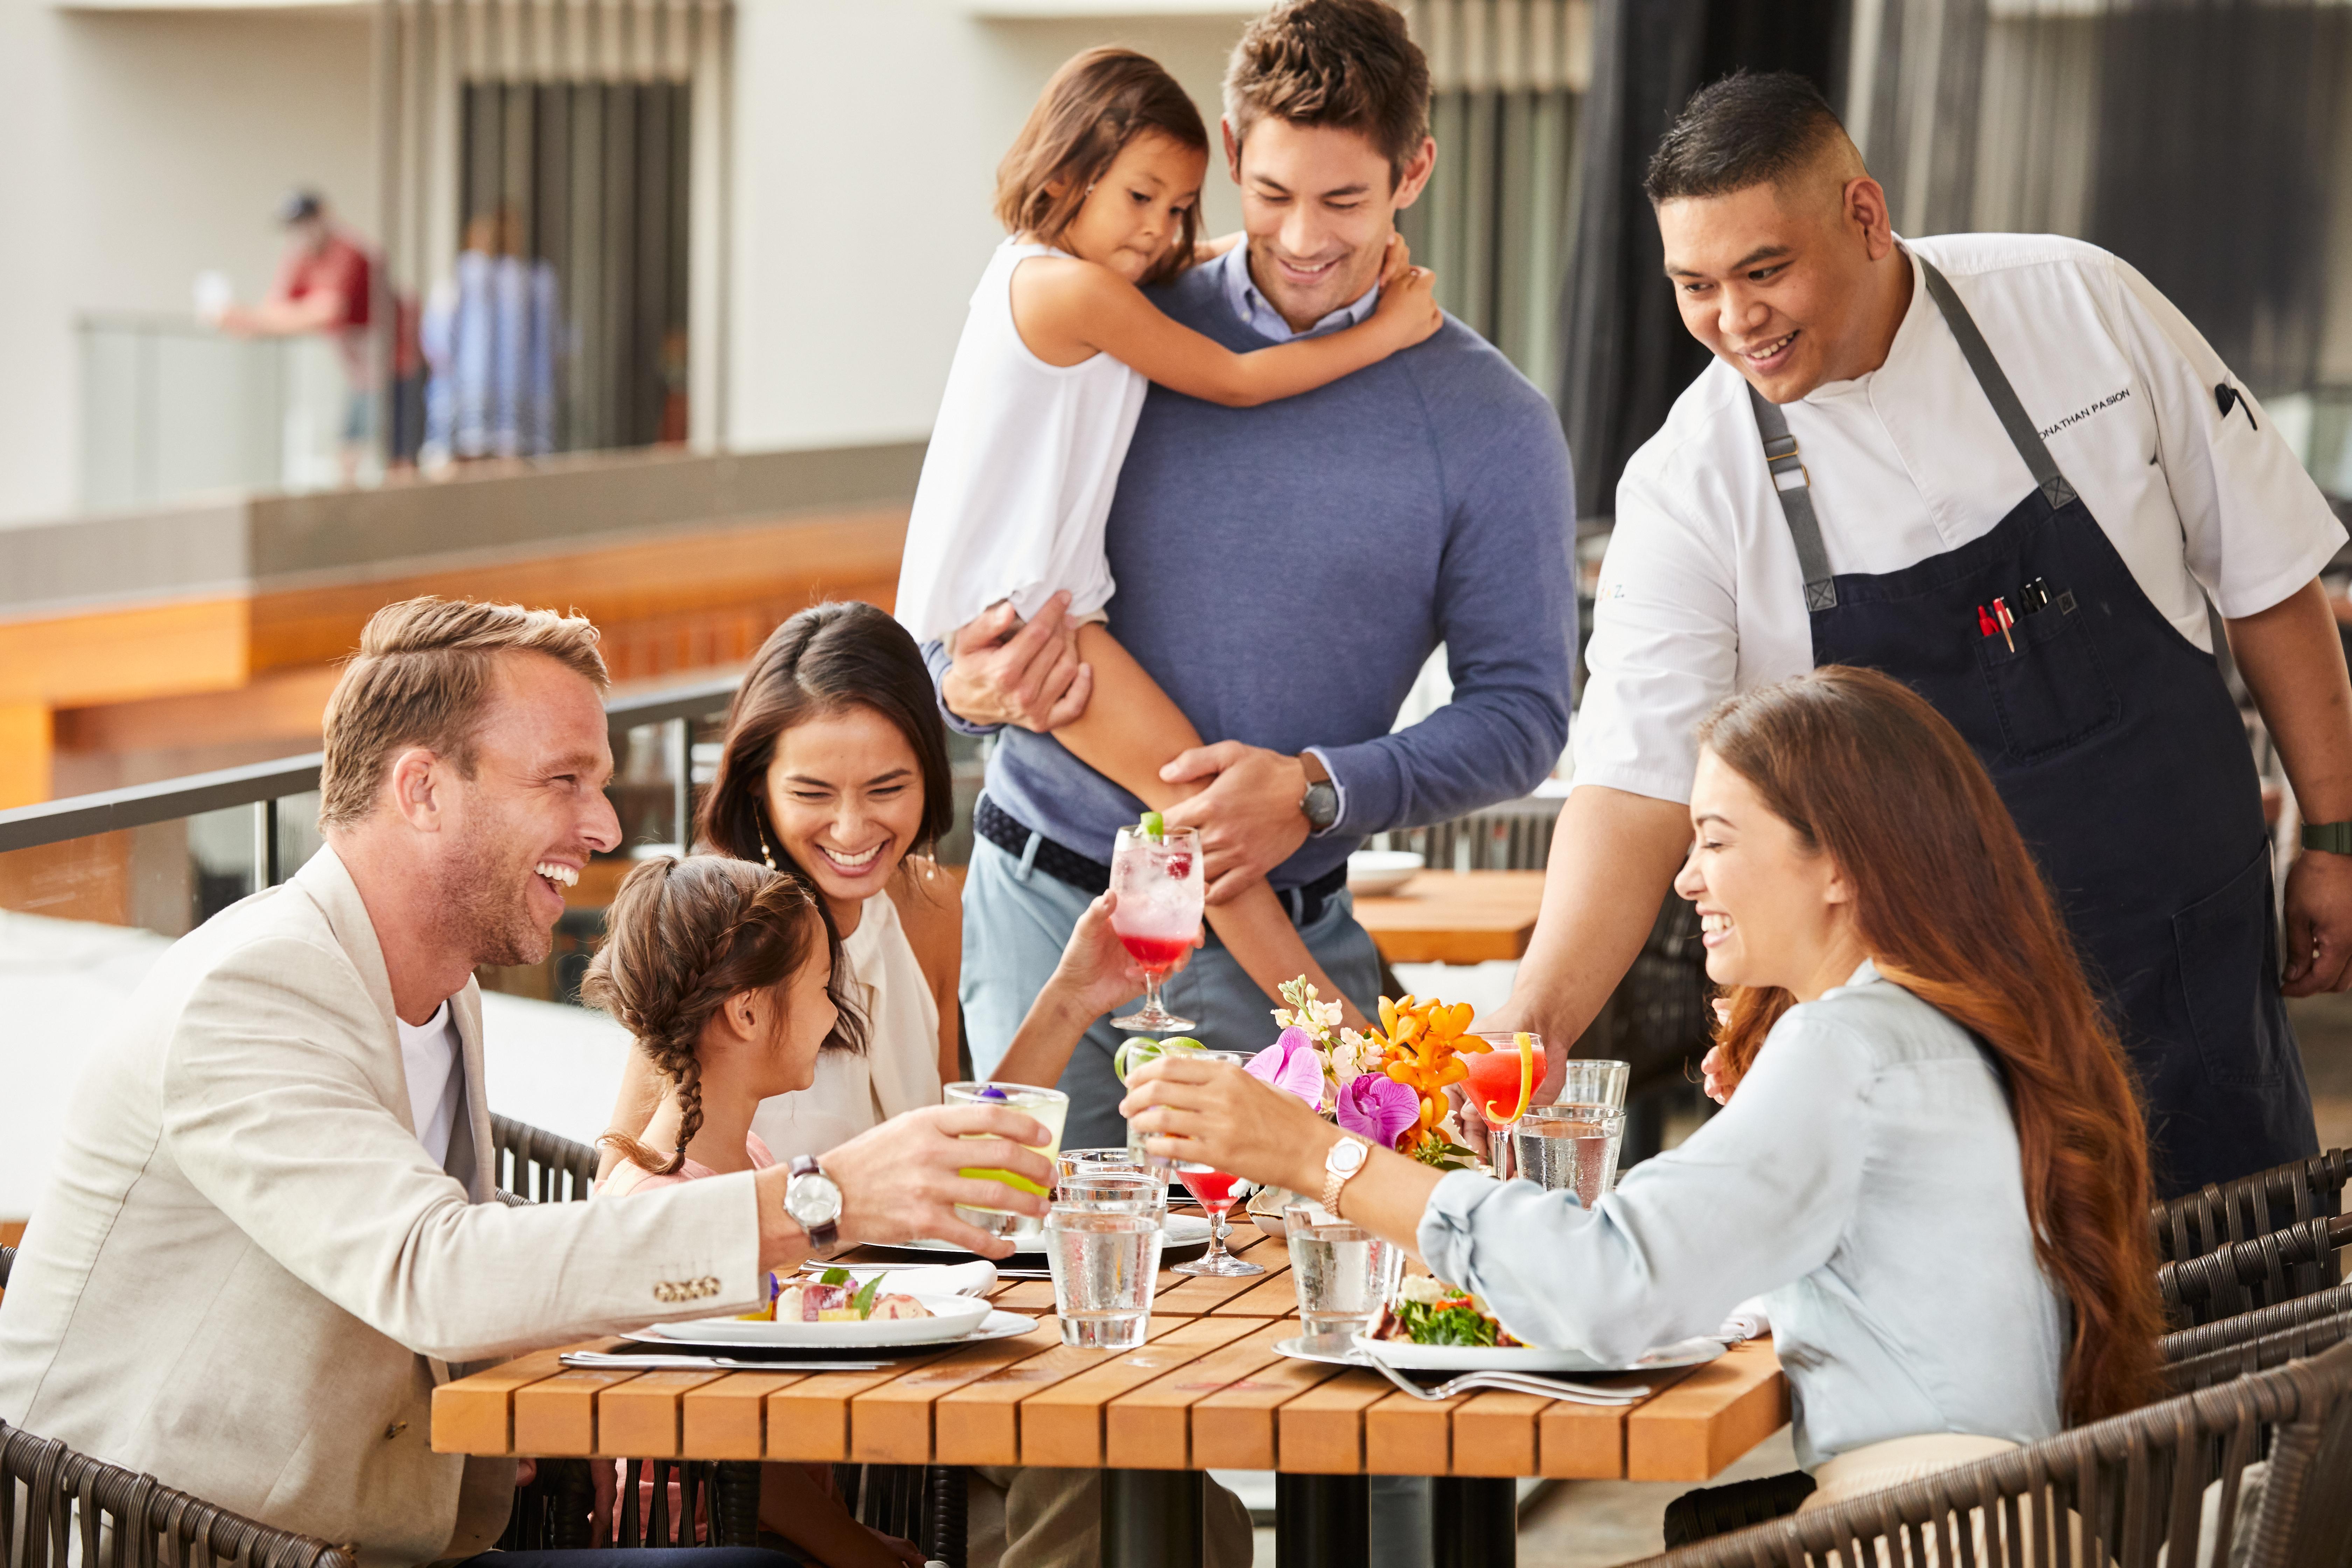 family eating at restaurant - HD1280×852